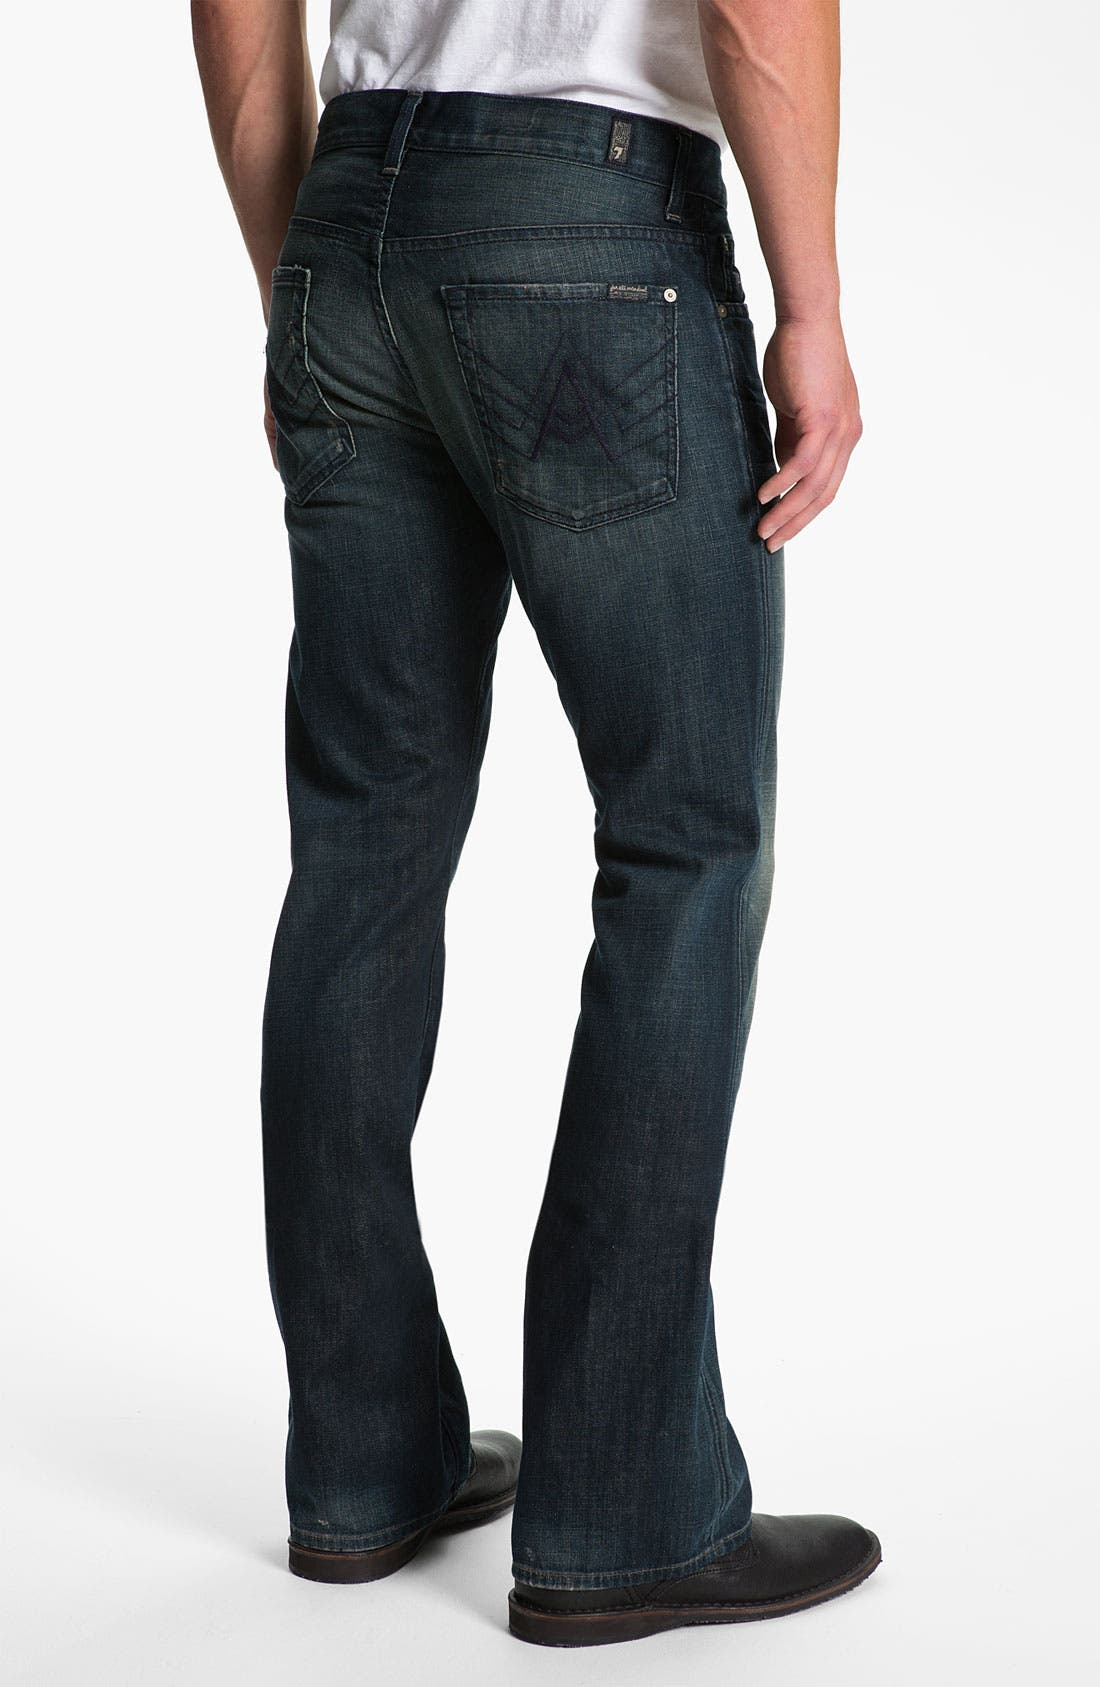 Alternate Image 1 Selected - 7 For All Mankind® 'Brett' Bootcut Jeans (Cedar Street)